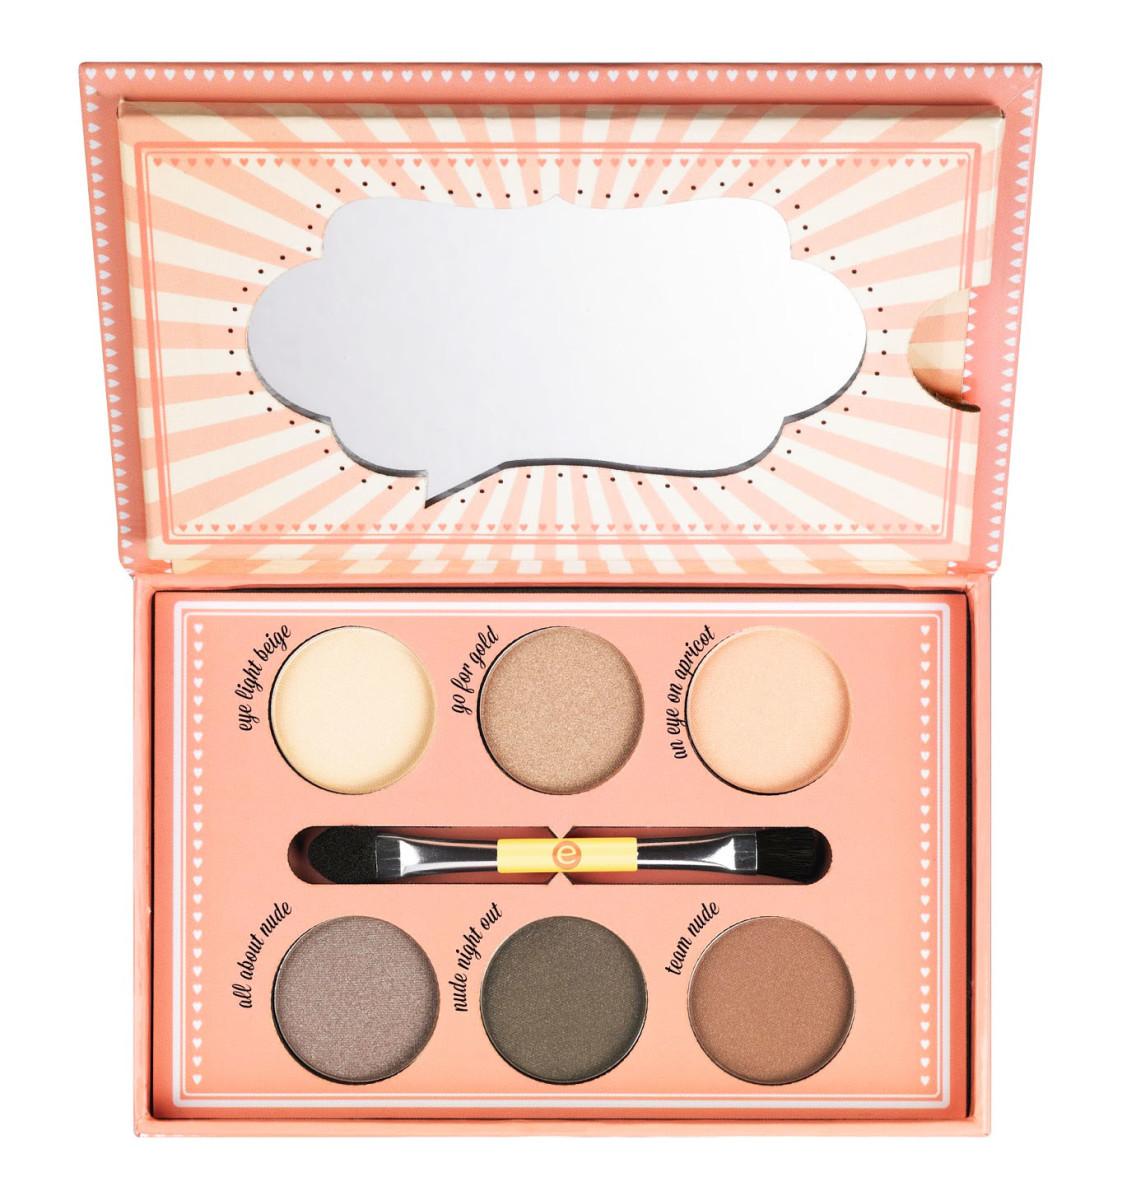 Essence How To Make Nude Eyes Make-Up Box